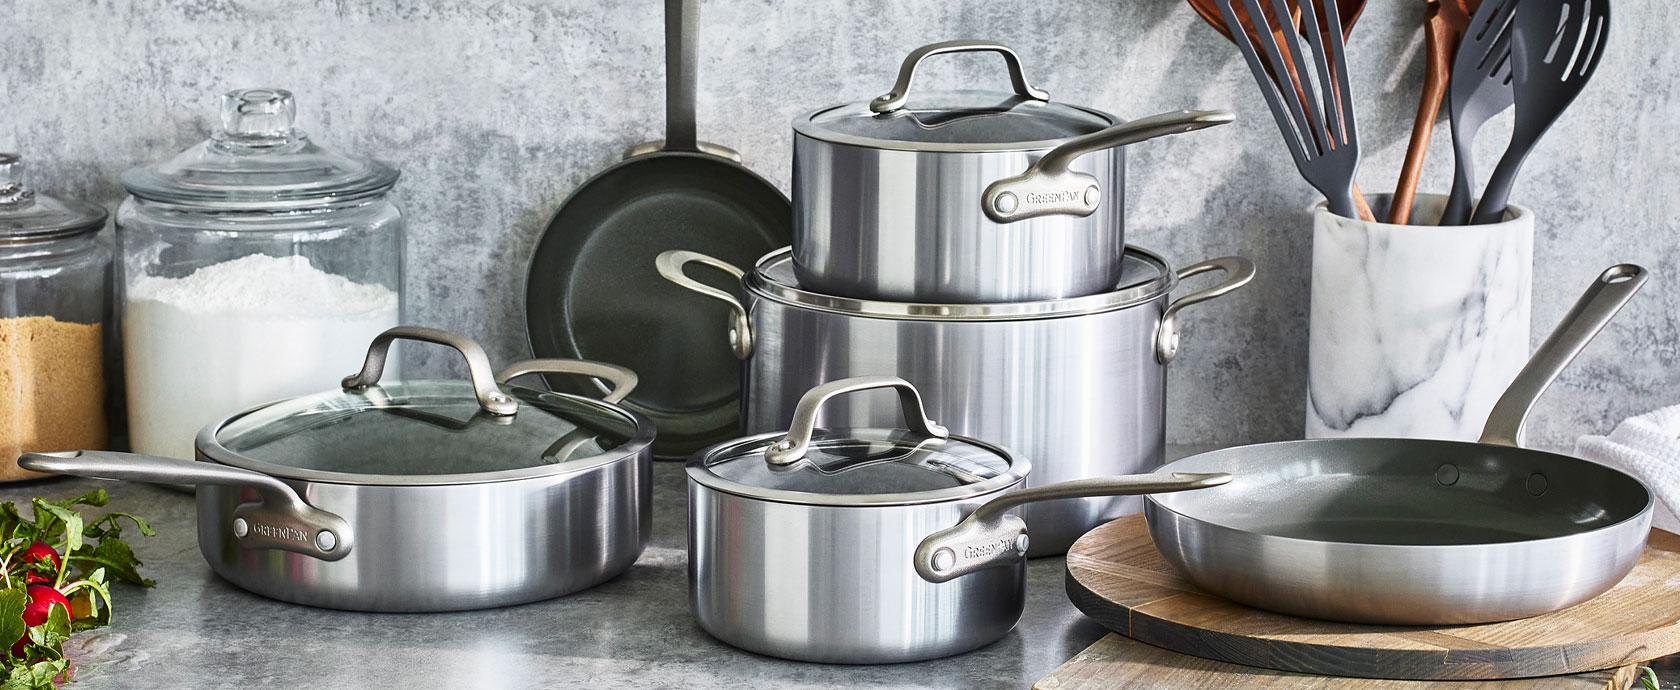 GreenPan nonstick cookware set with lids